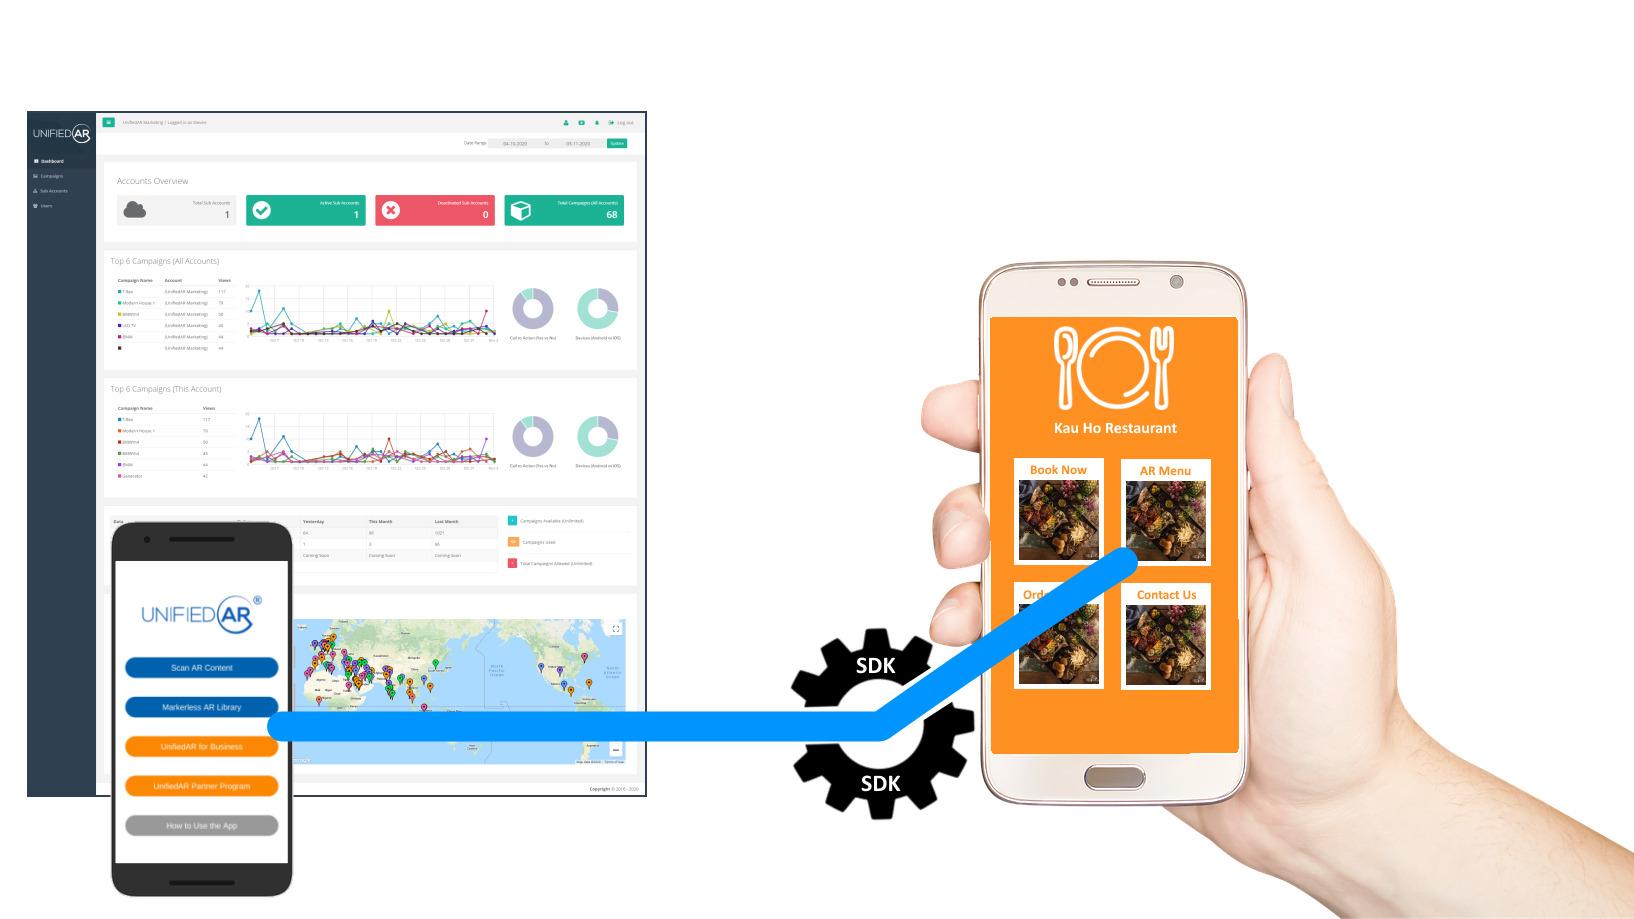 Augmented Reality SDK